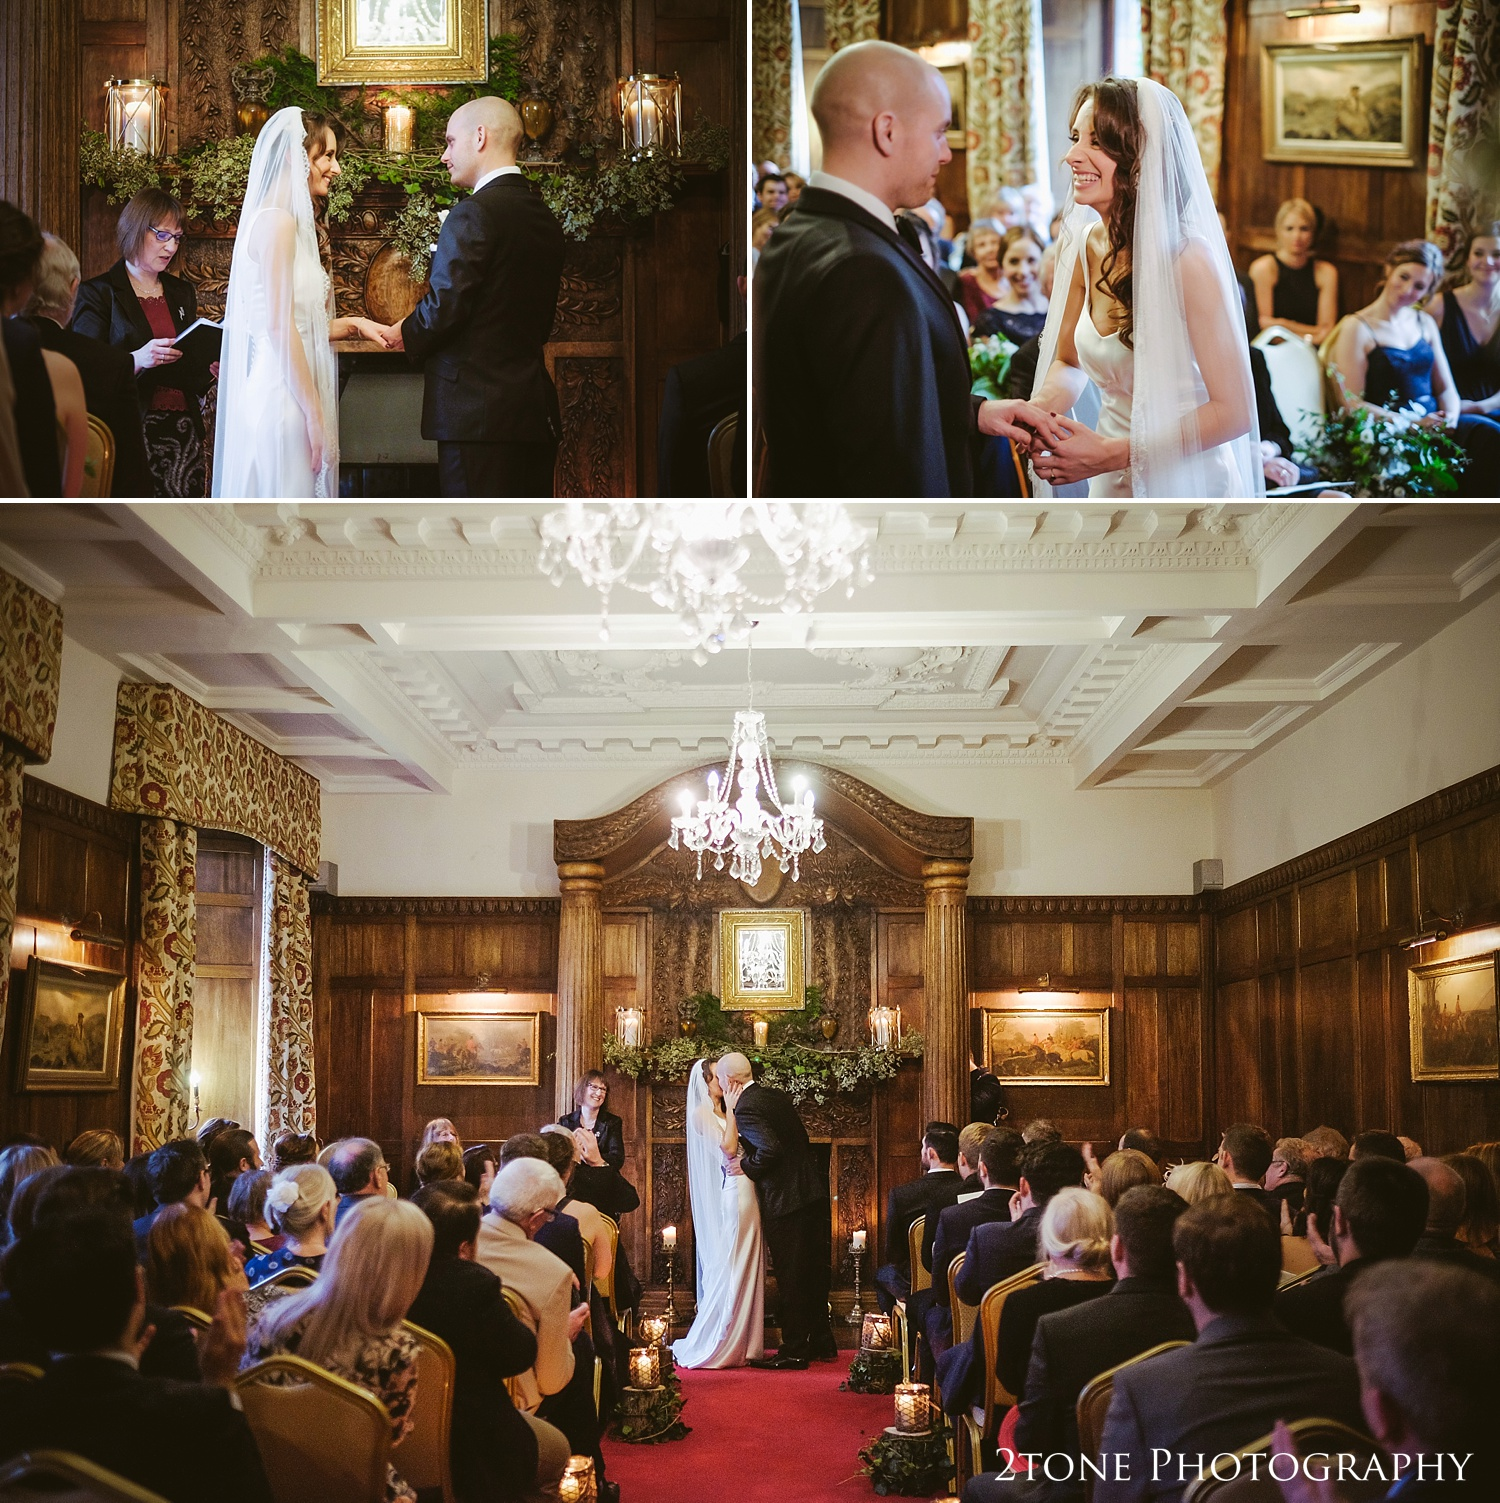 Weddings at Ellingham Hall. Winter wedding photography by www.2tonephotography.co.uk